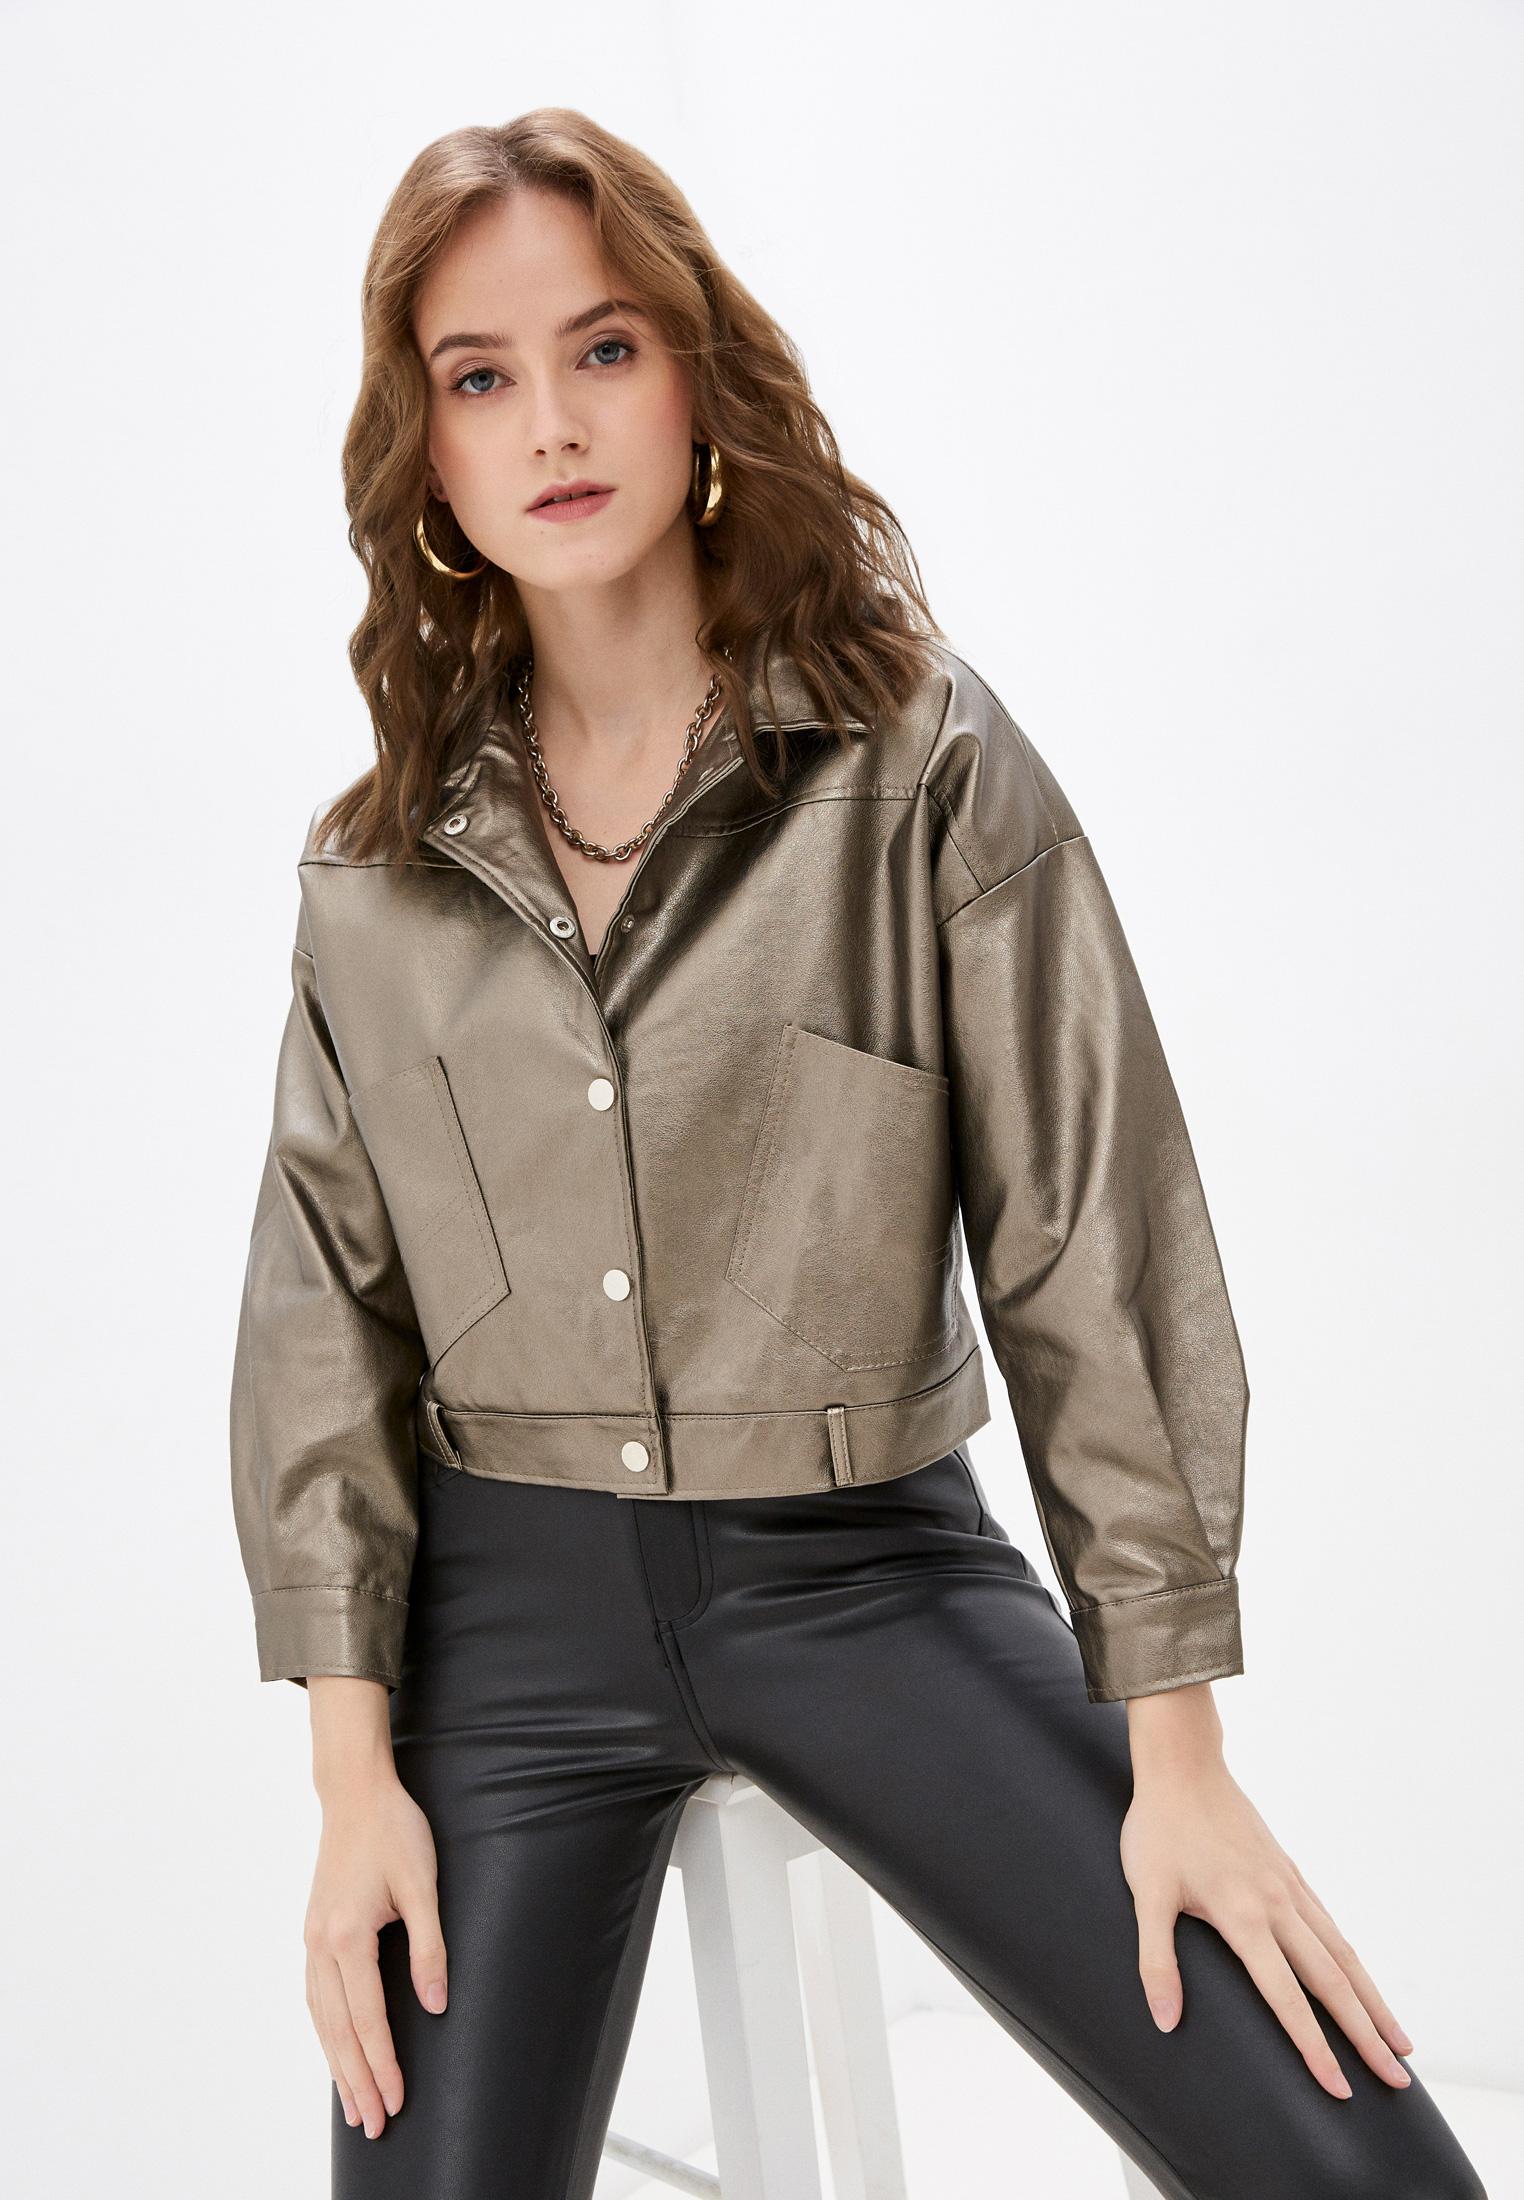 Кожаная куртка Softy Куртка кожаная Softy